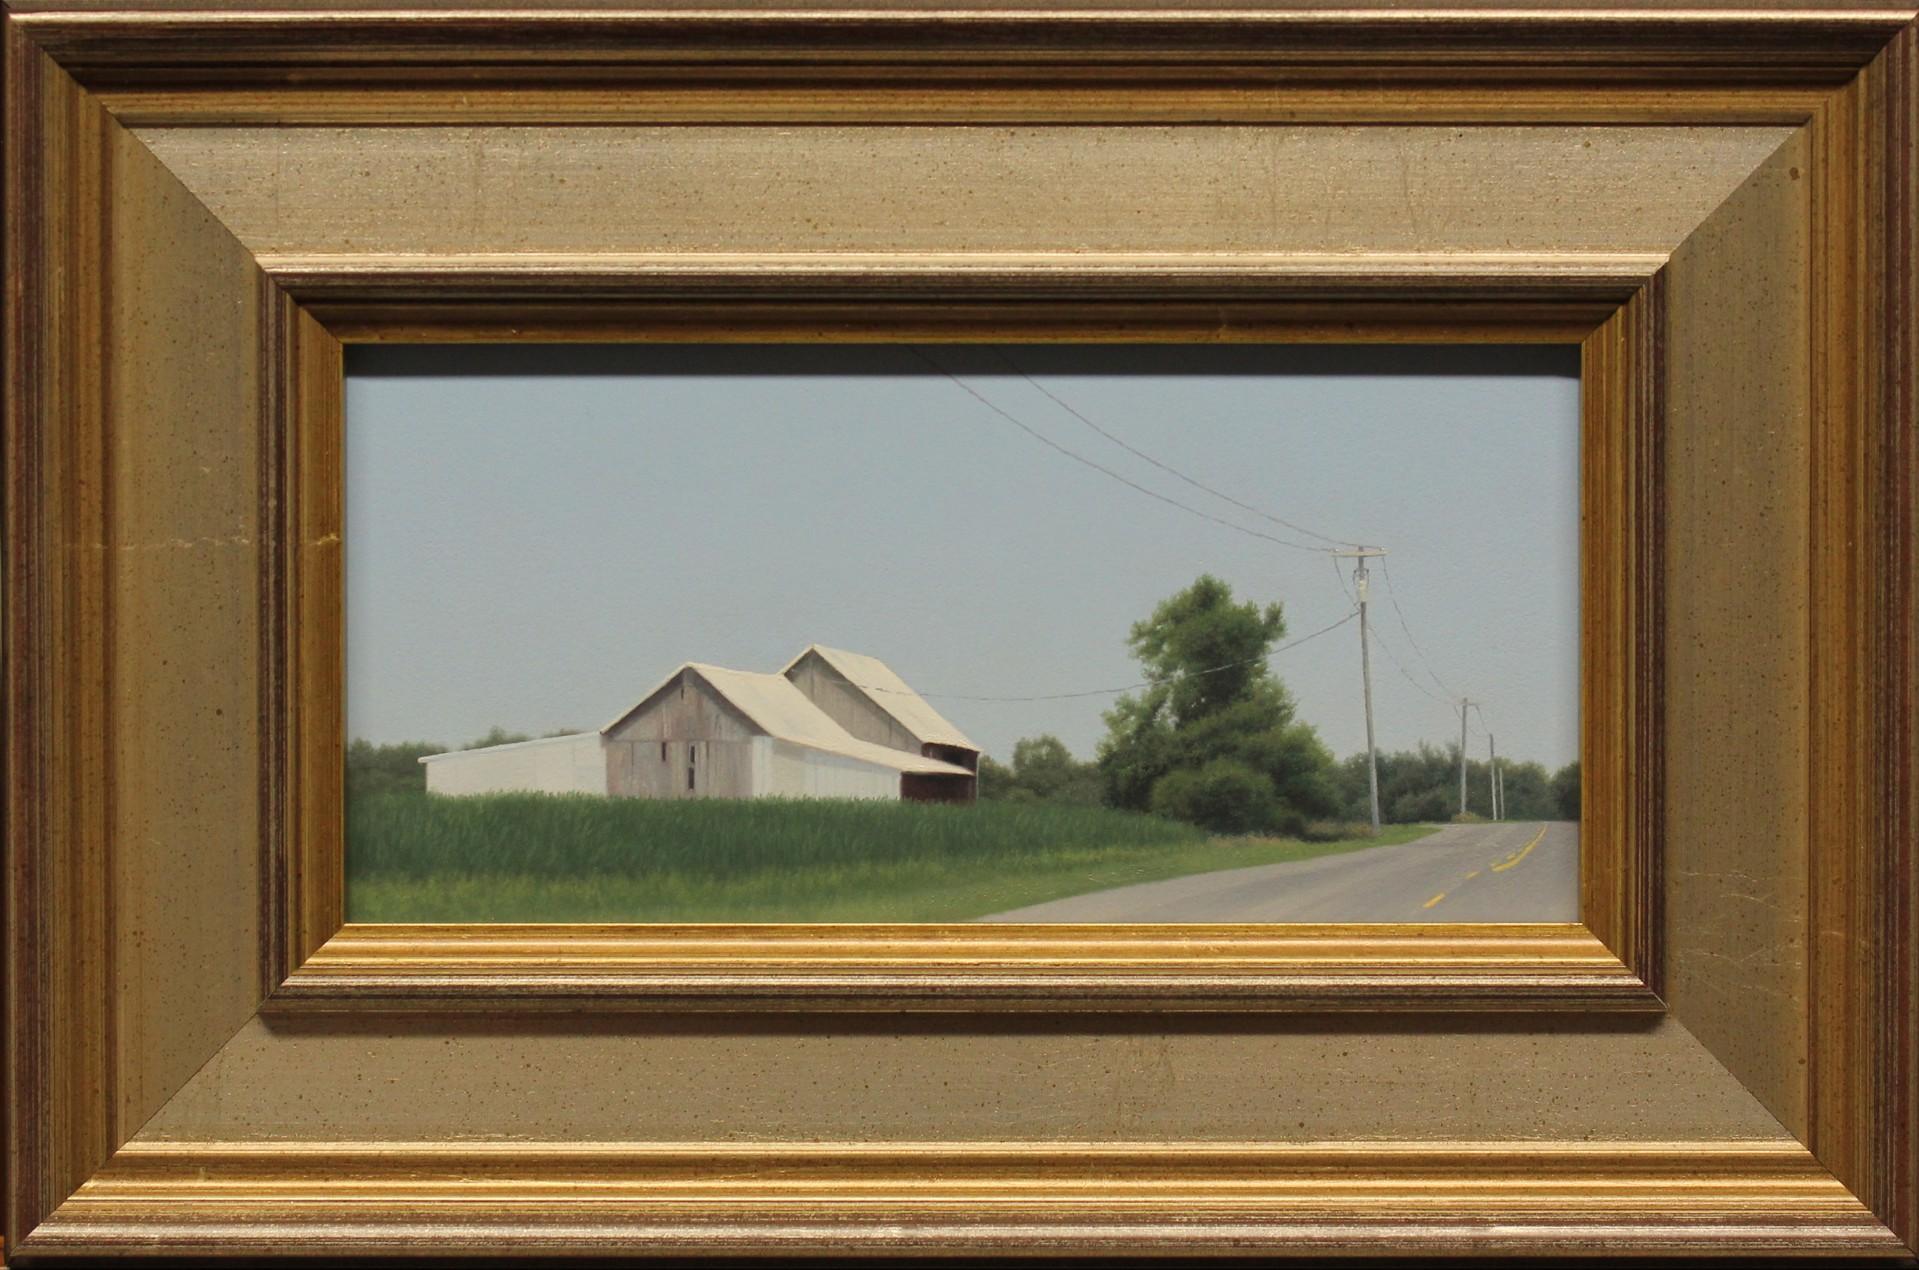 Farm Country by Brett Scheifflee